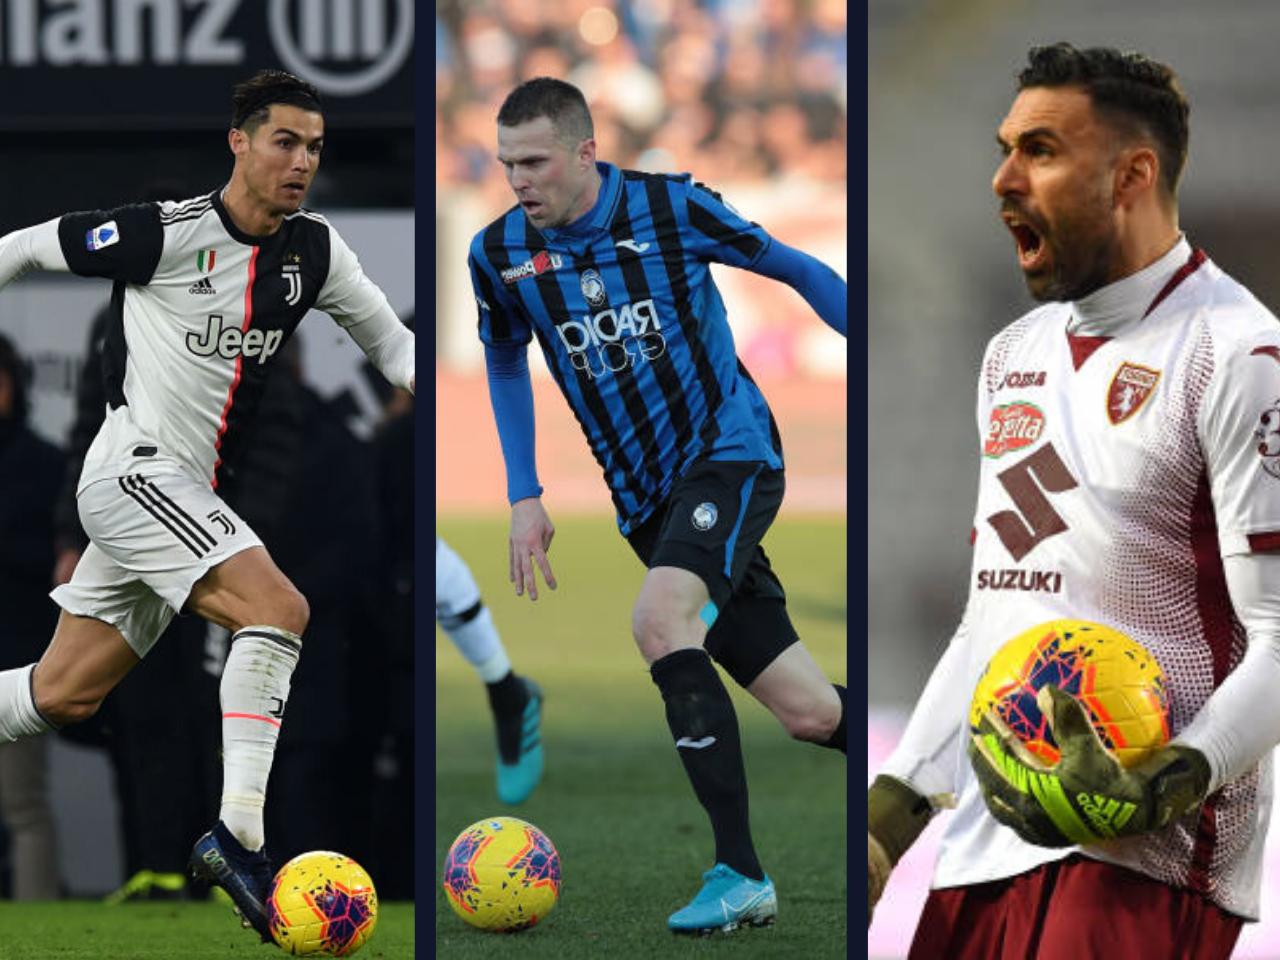 Cristiano Ronaldo, Josip Ilicic, Salvatore Sirigu